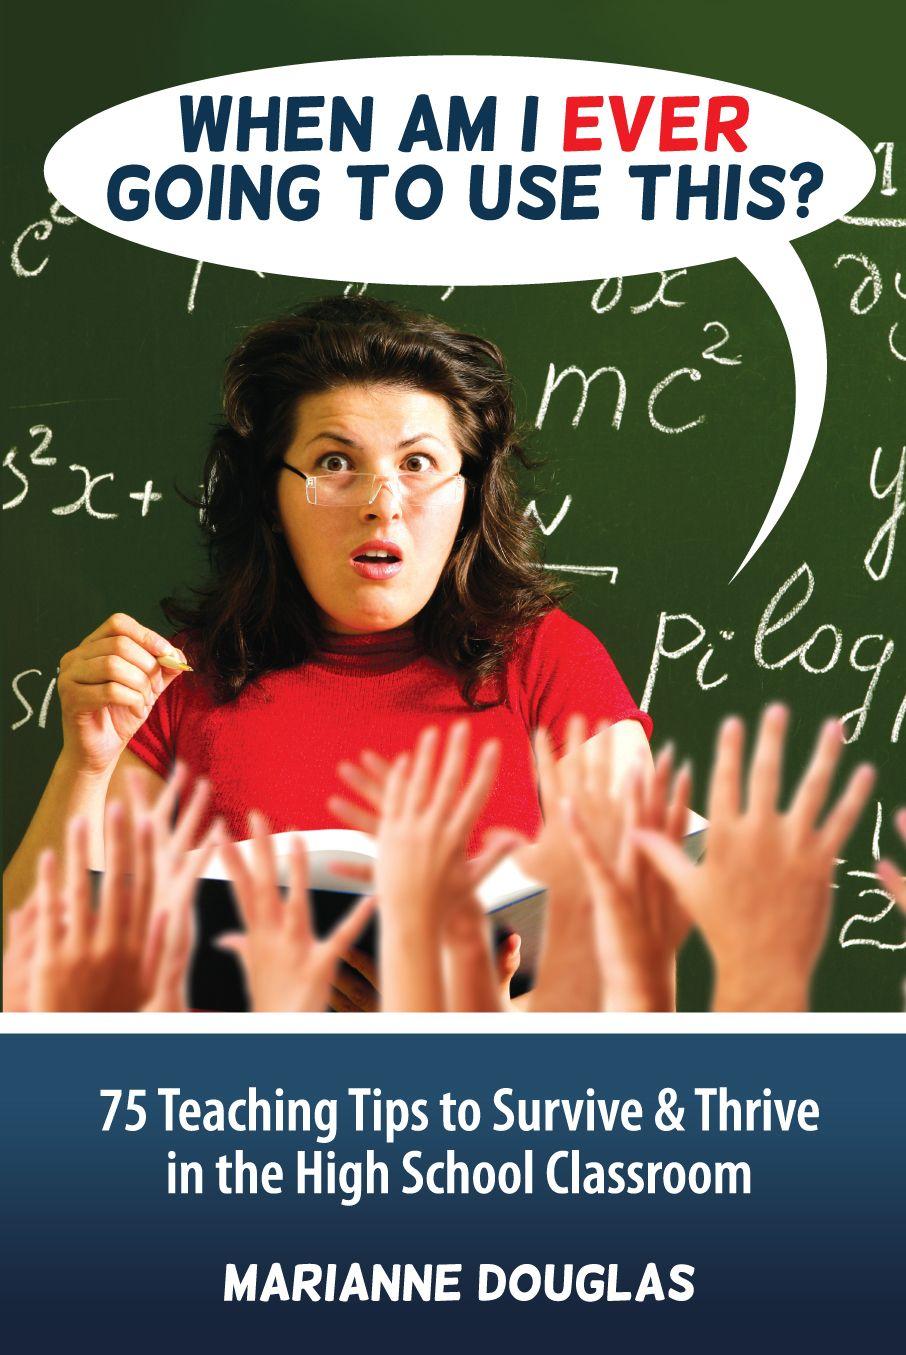 A book of 75 teaching tips for high school teachers.